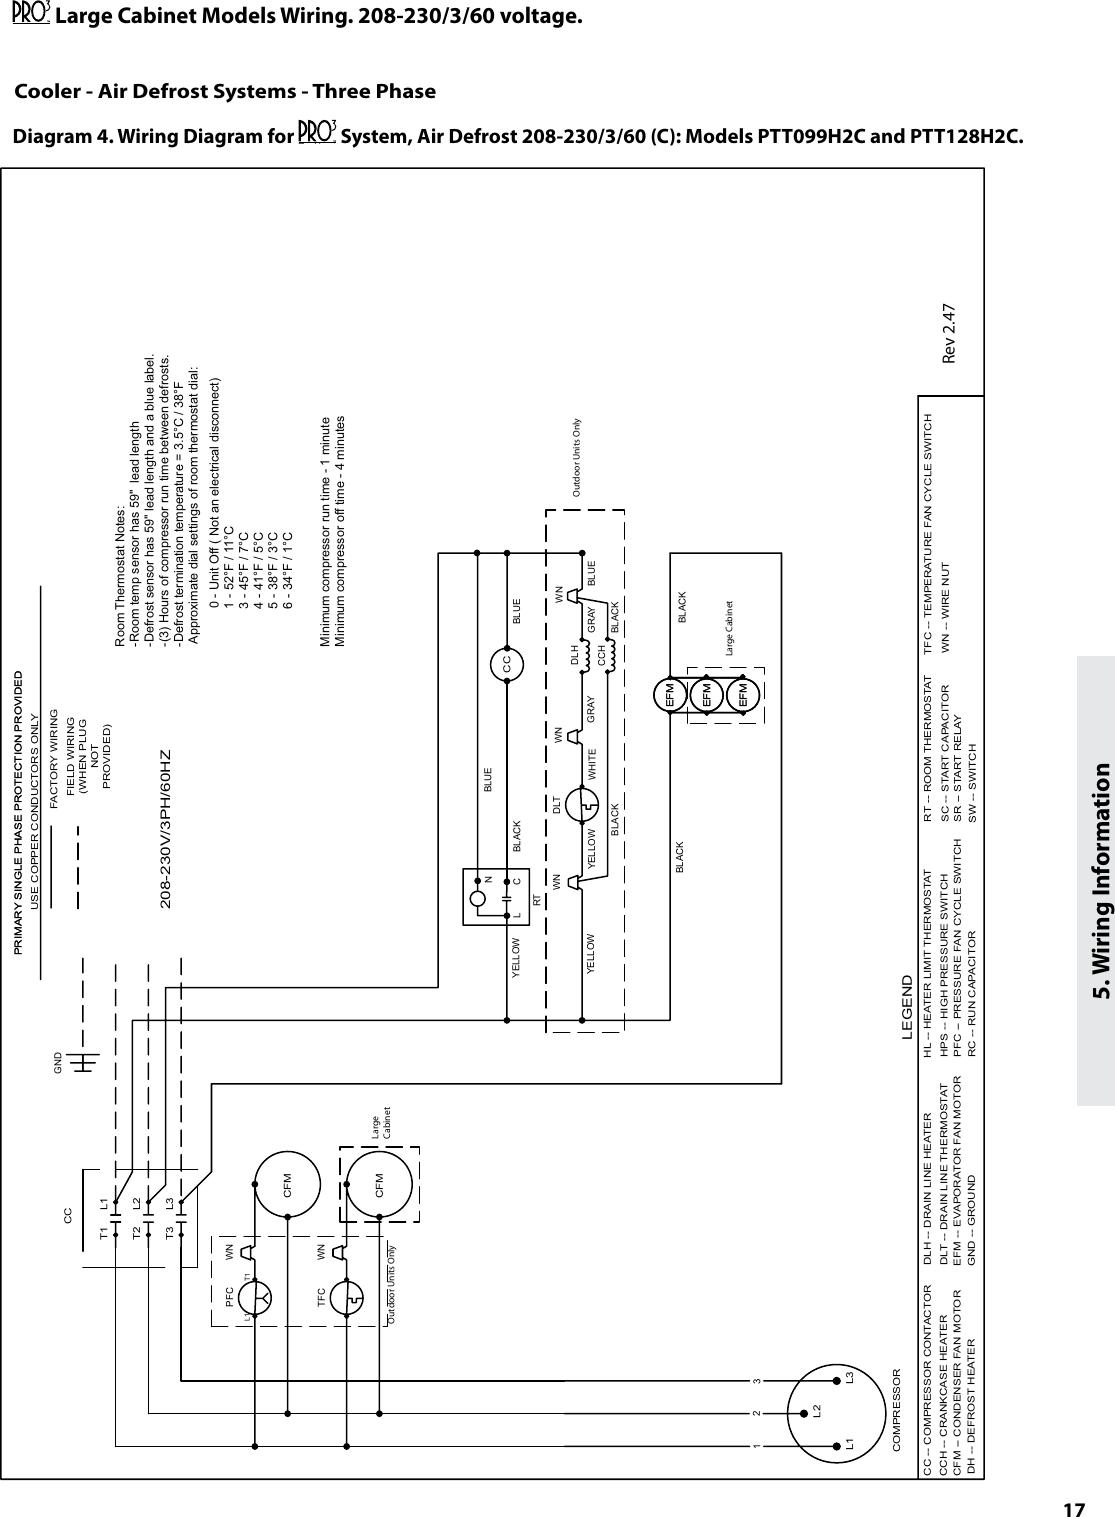 heatcraft evaporator coil wiring diagram heatcraft refrigeration products system h im 82b users manual  heatcraft refrigeration products system